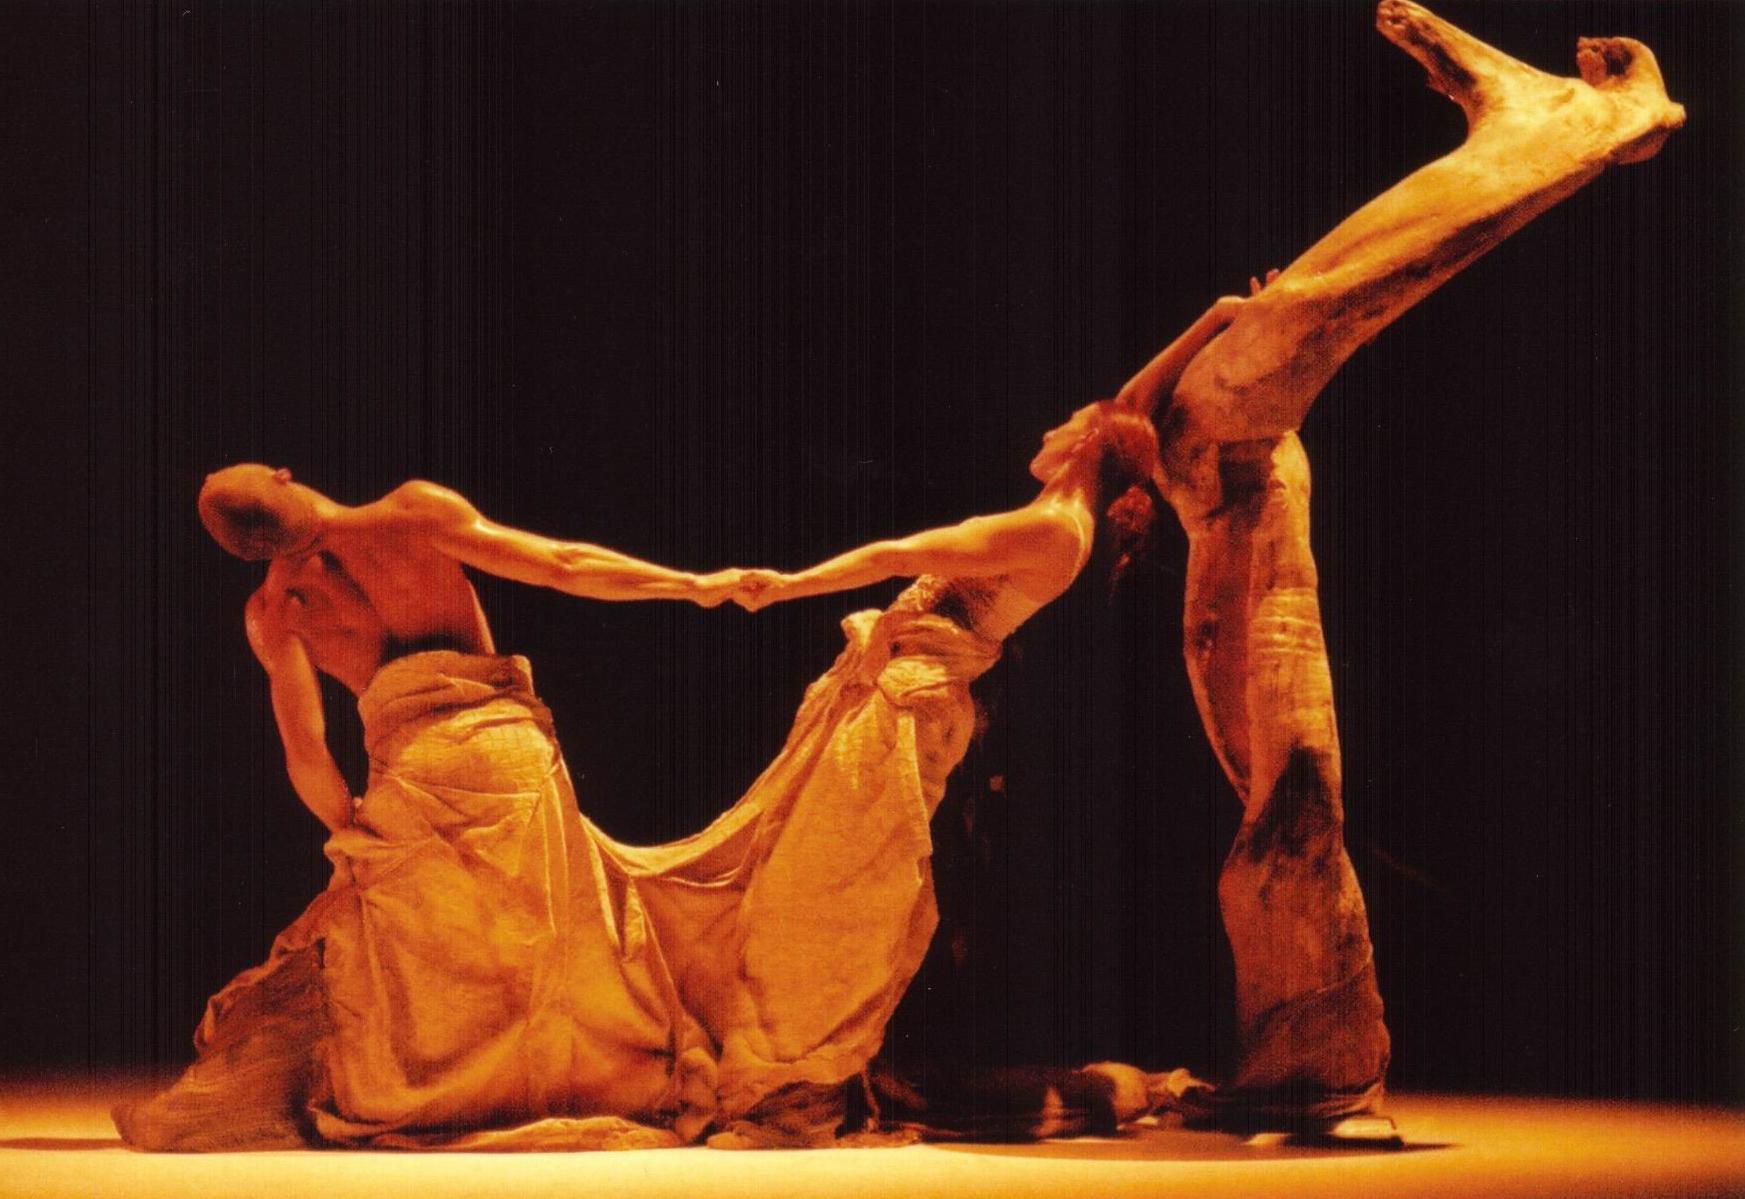 Les Discrets - Octobre 2003 ©JC Marceteau